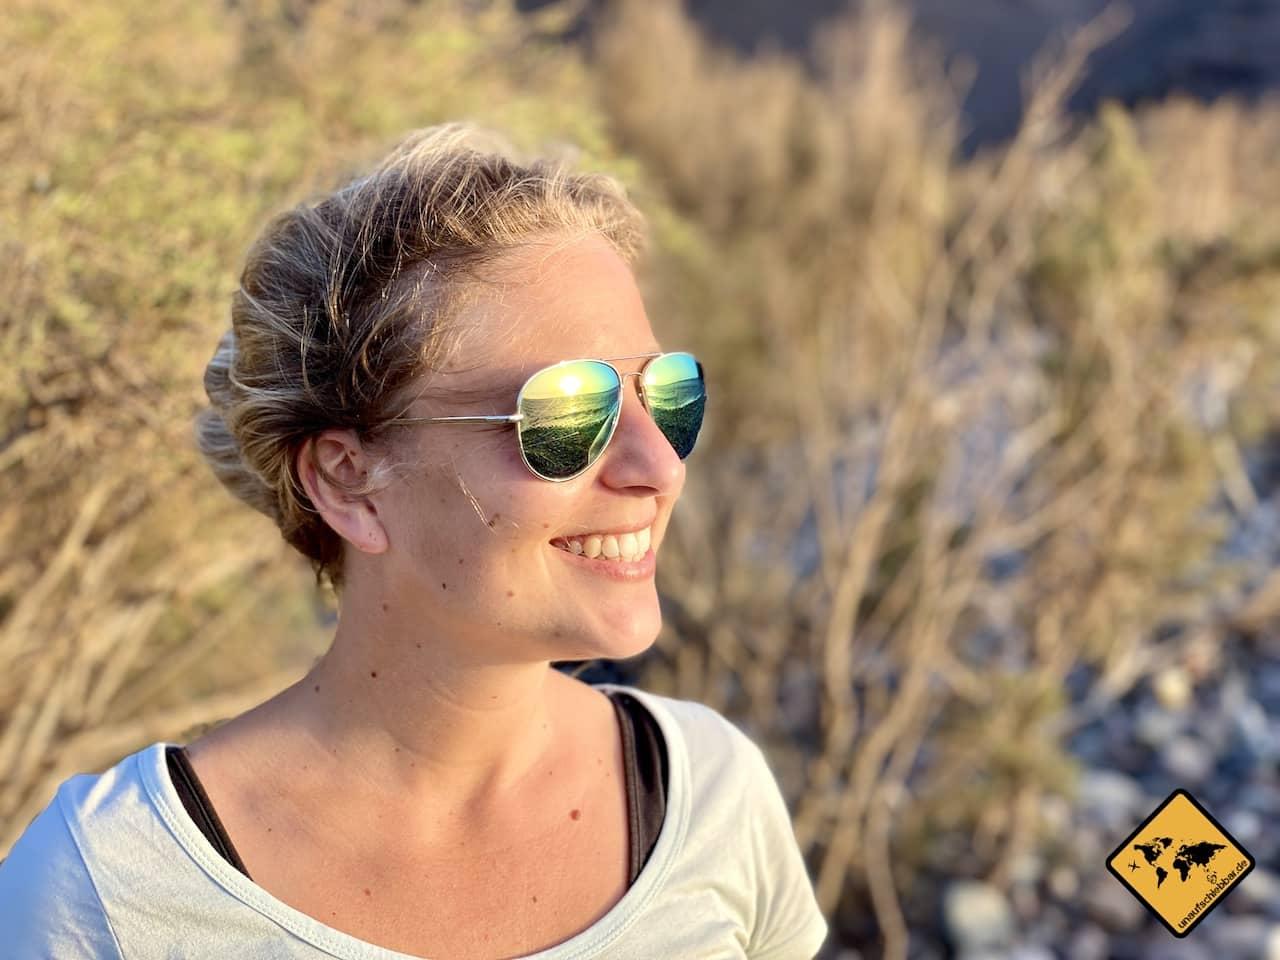 Portraitfotografie Ideen Spiegelung Sonnenbrille